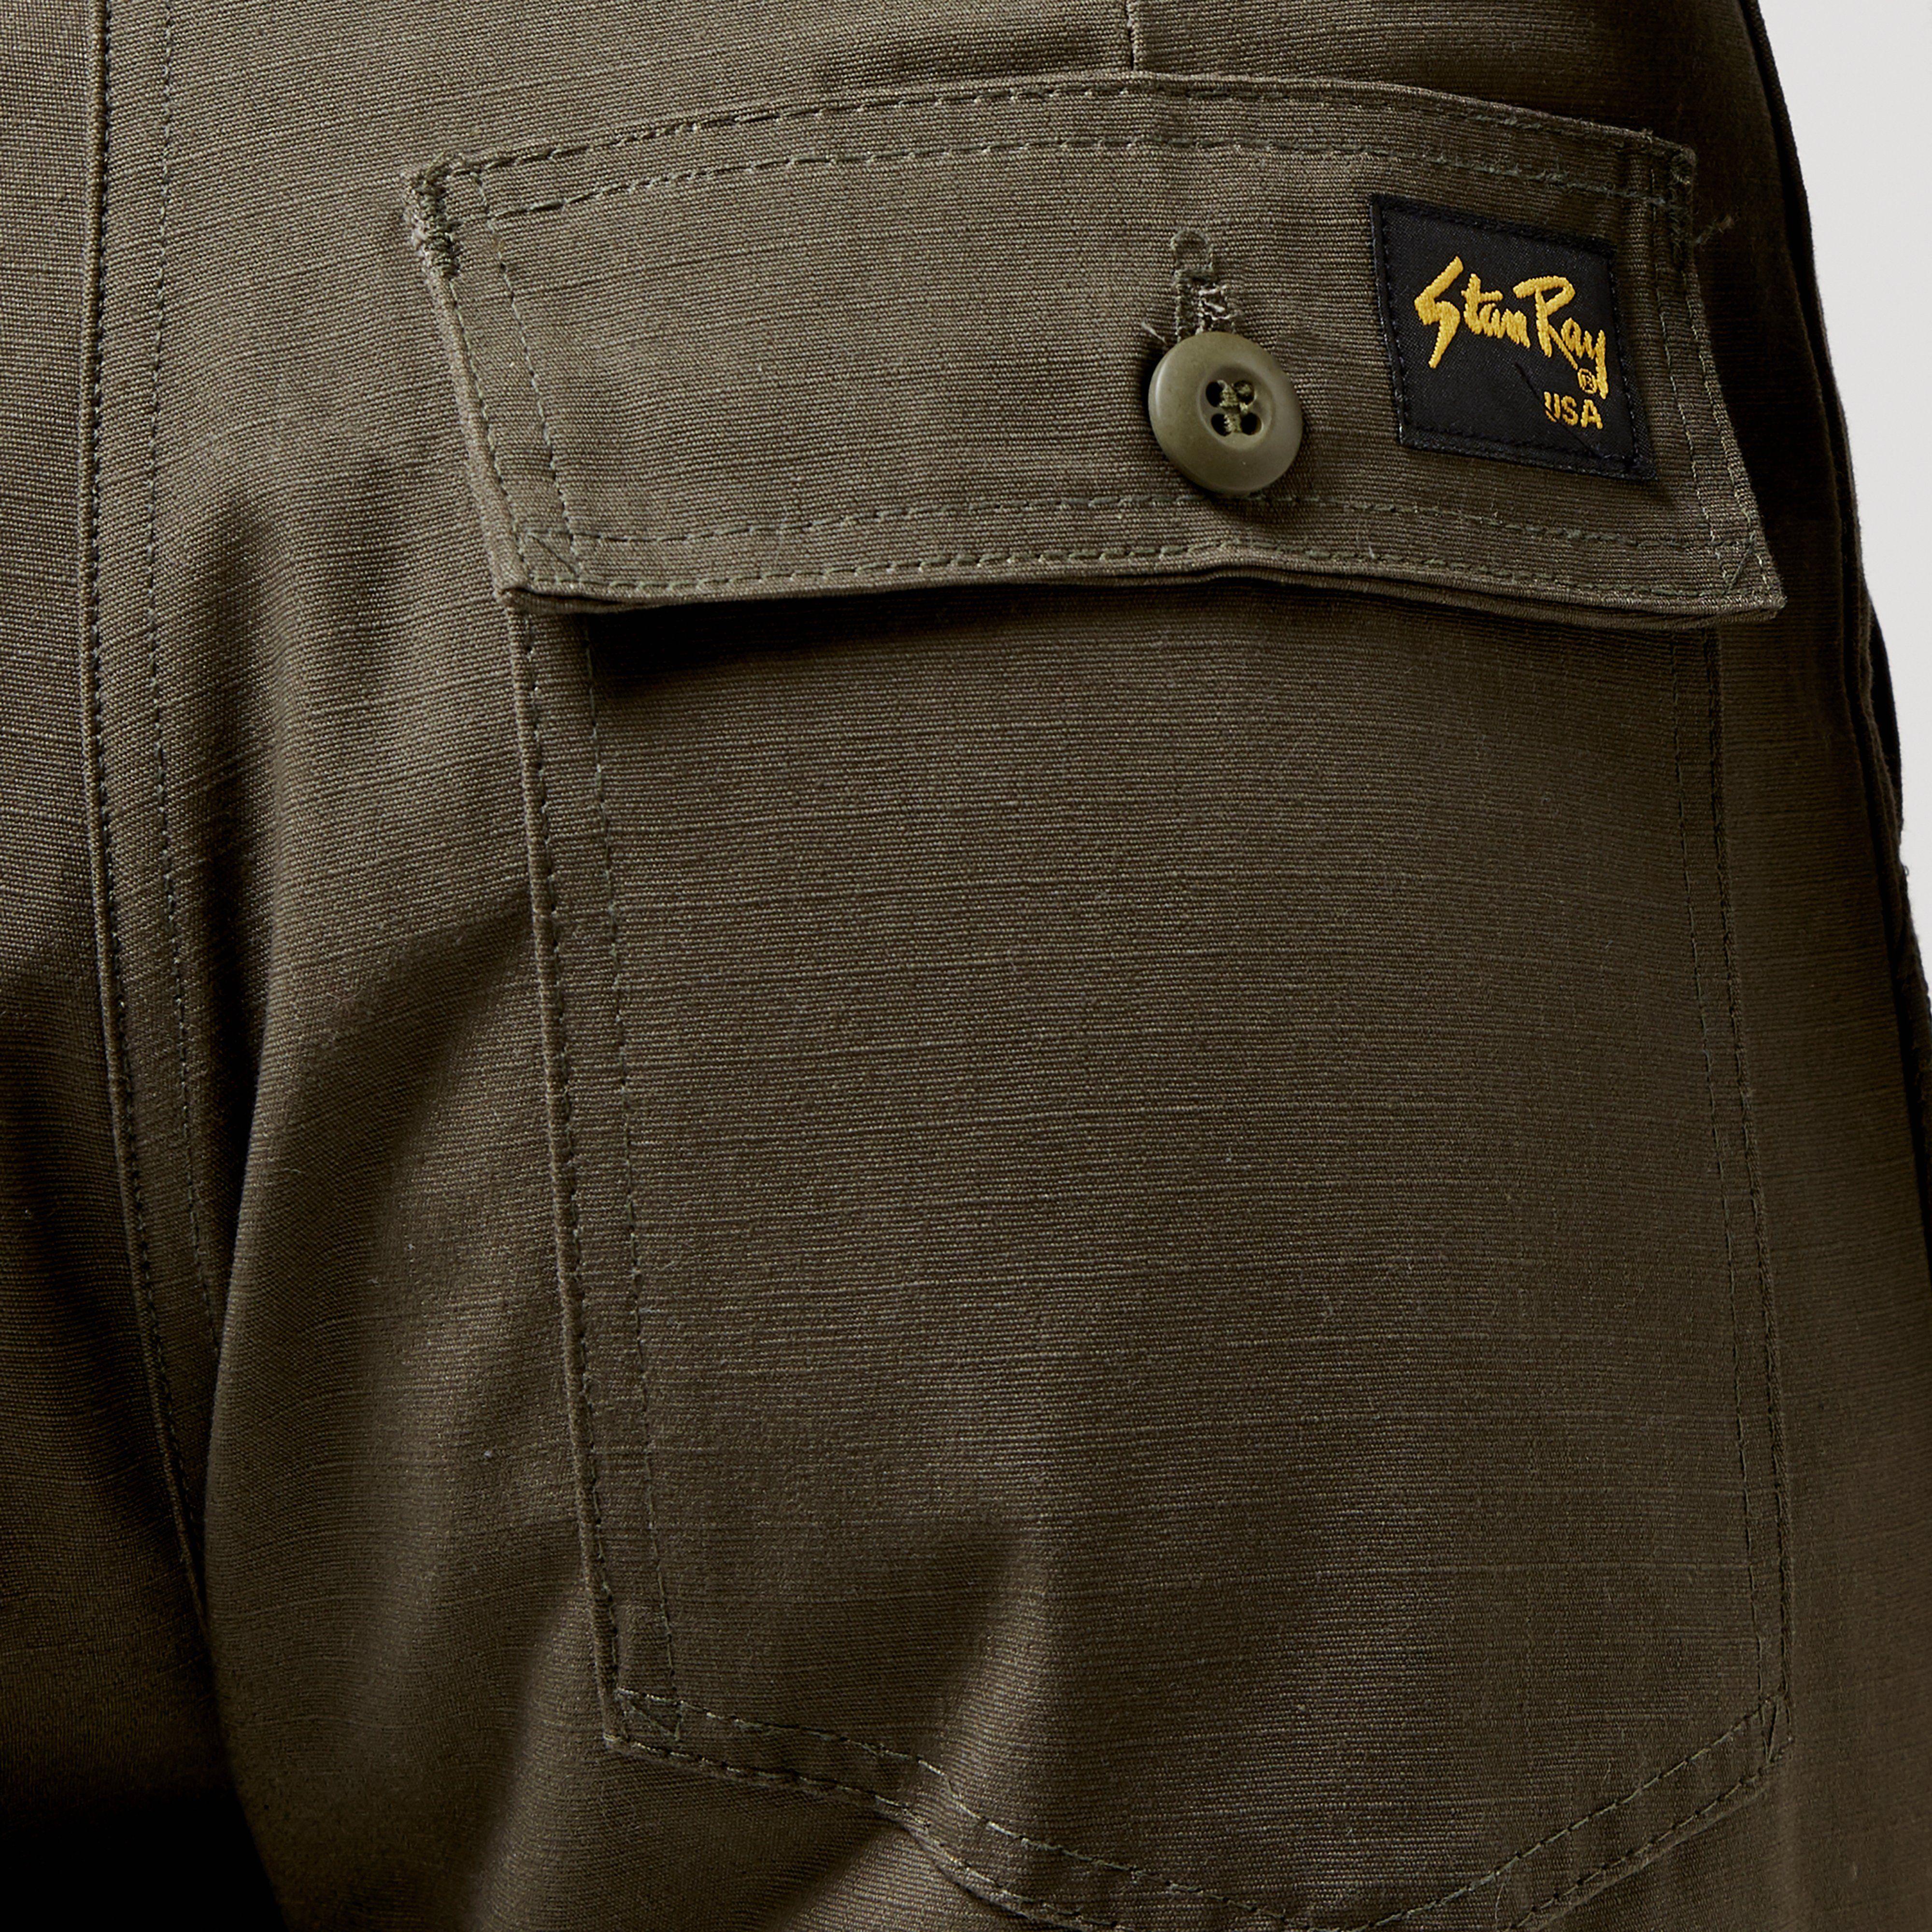 Stan Ray Ripstop Taper Fatigue Pants